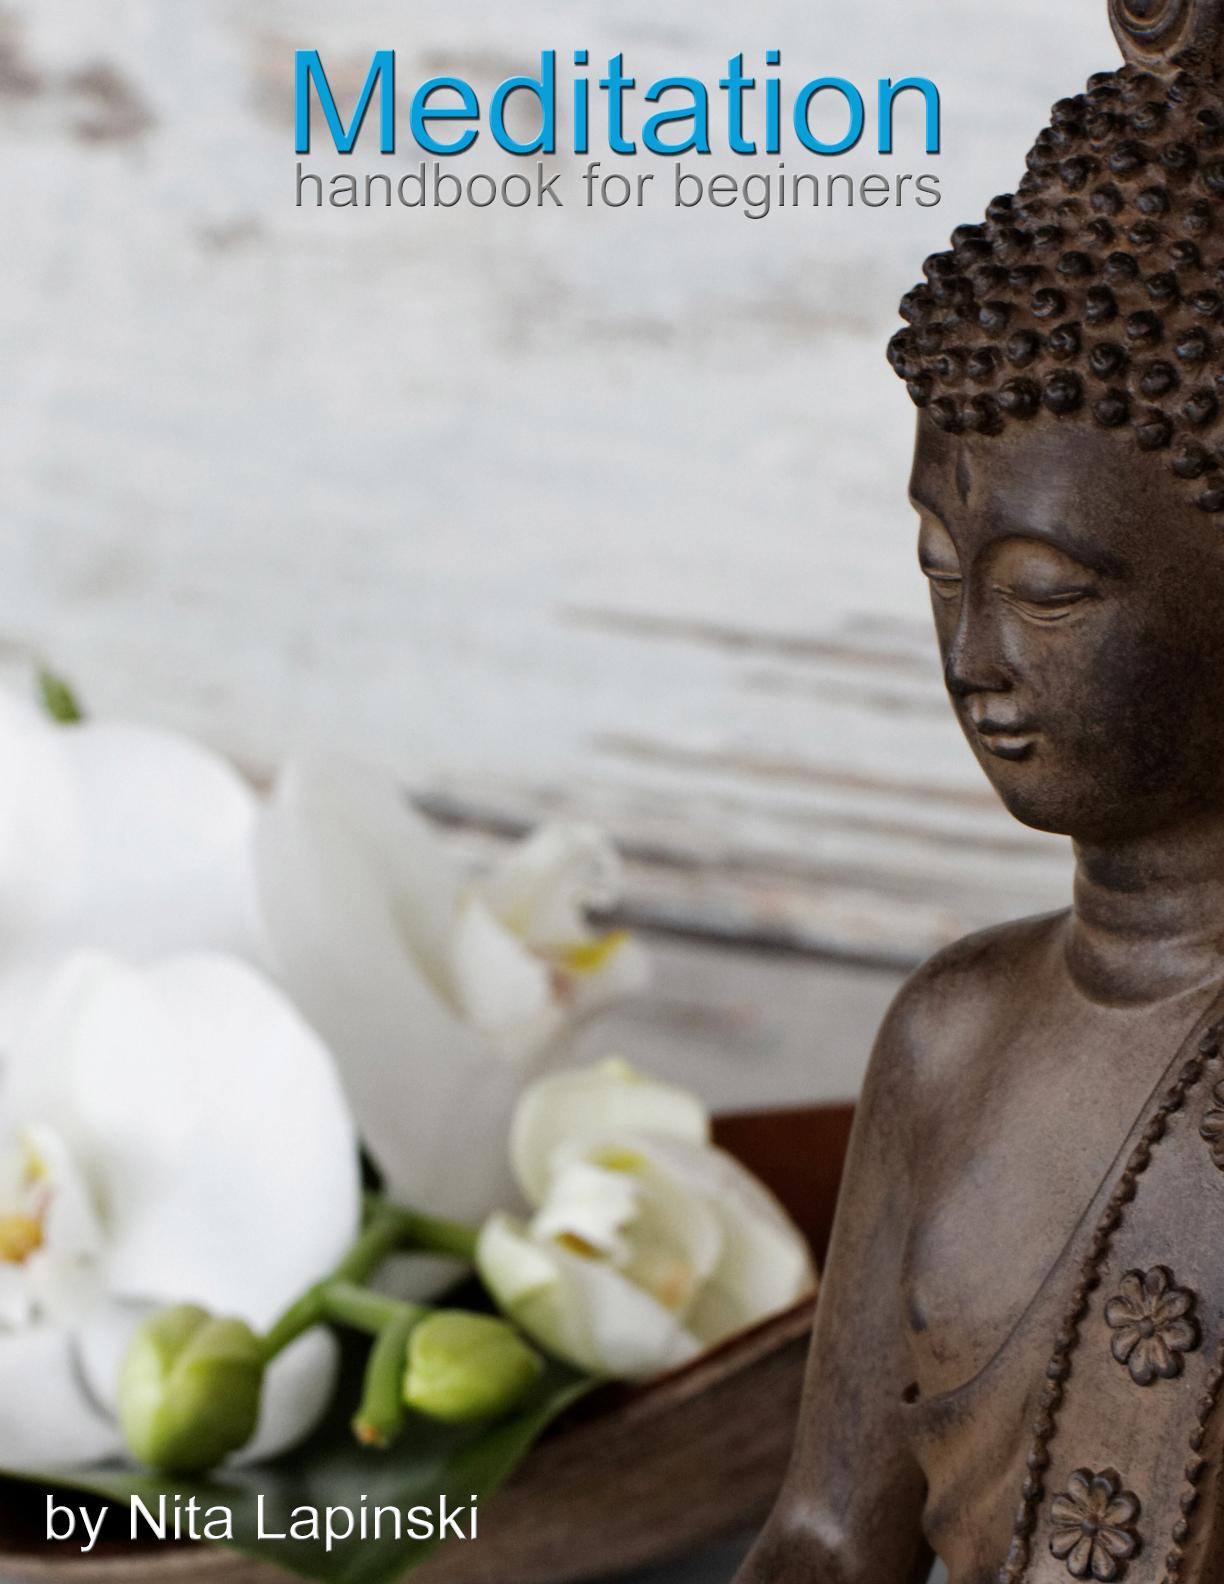 Meditation Handbook for Beginners by Nita Lapinski